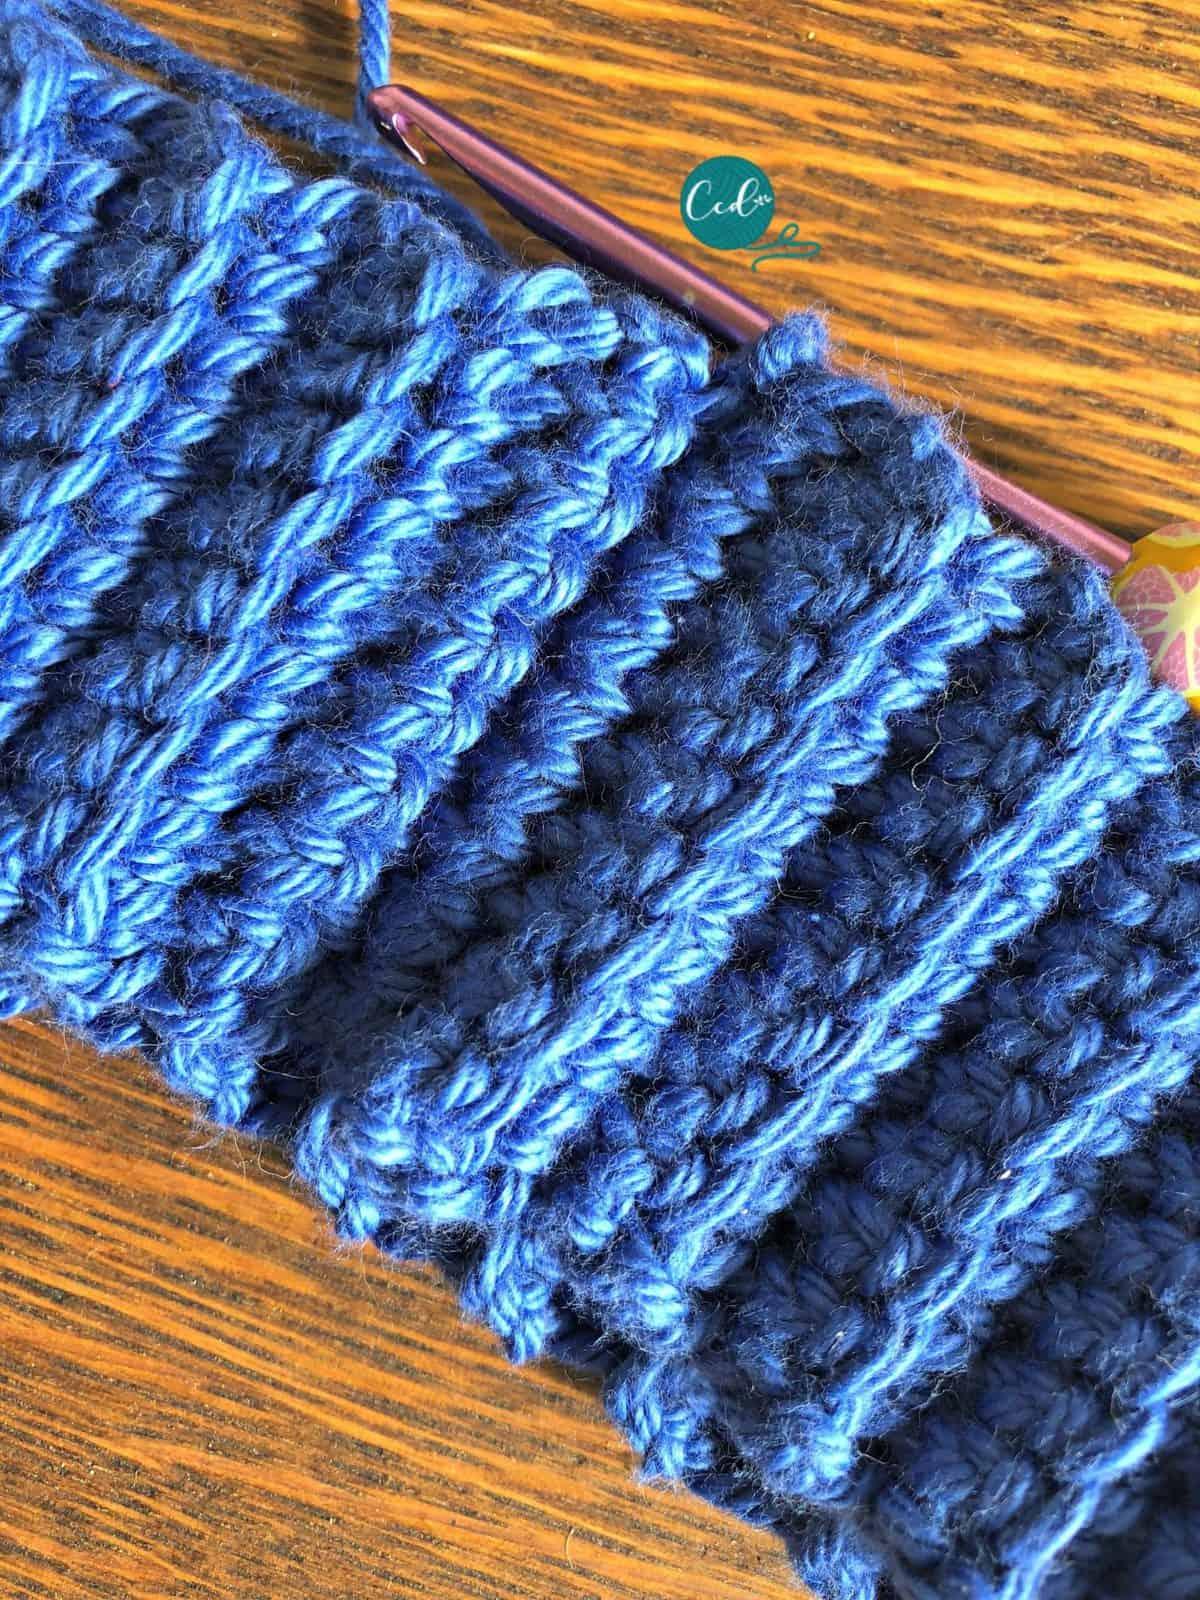 Ribbing in blue yarn.